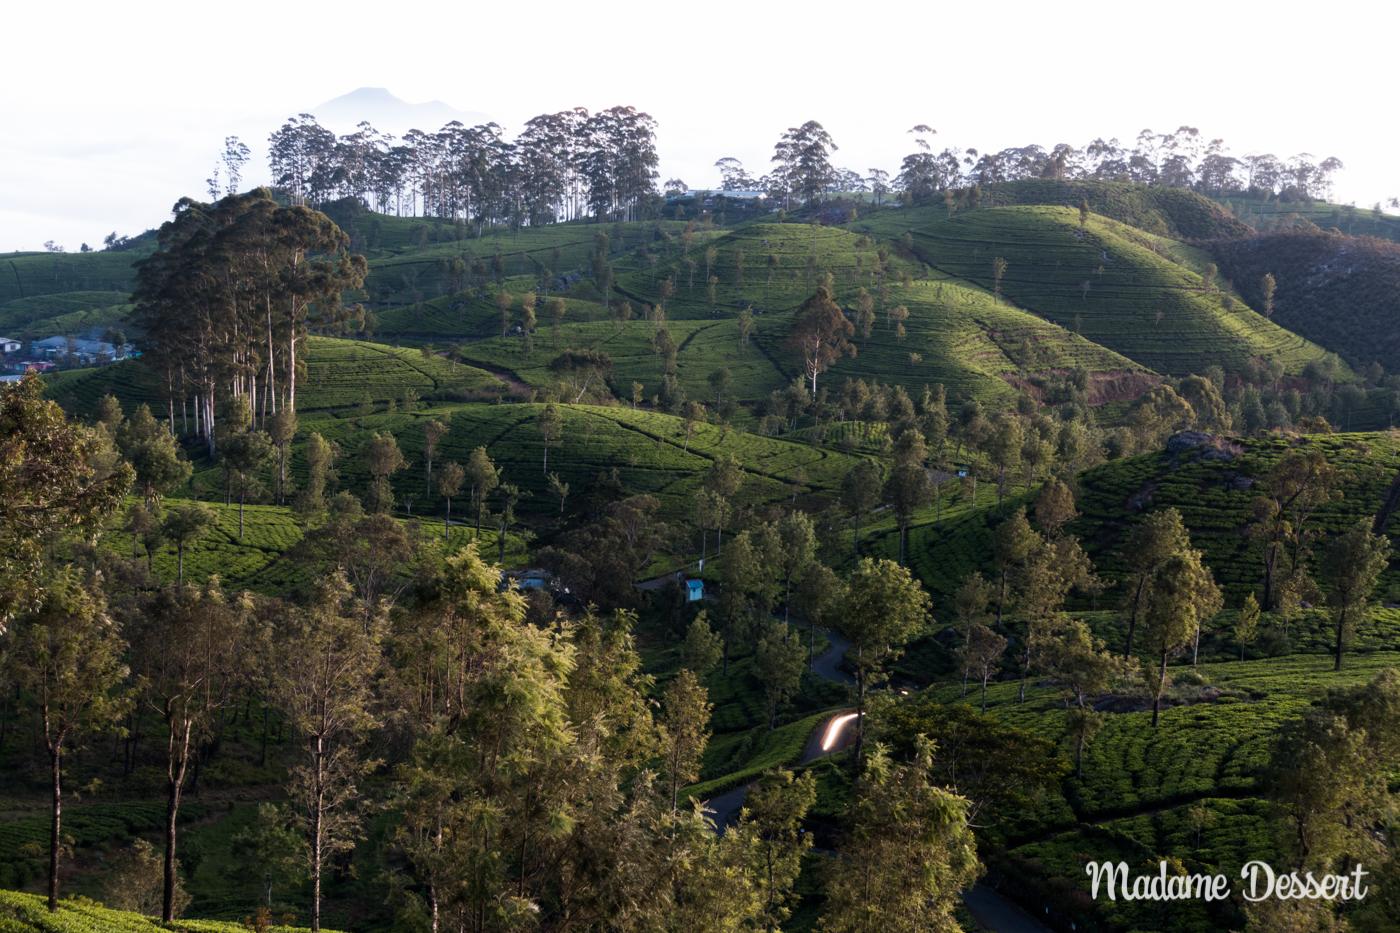 Schwarzer Ceylon Tee aus Sri Lanka | Ceylon Tea | Madame Dessert